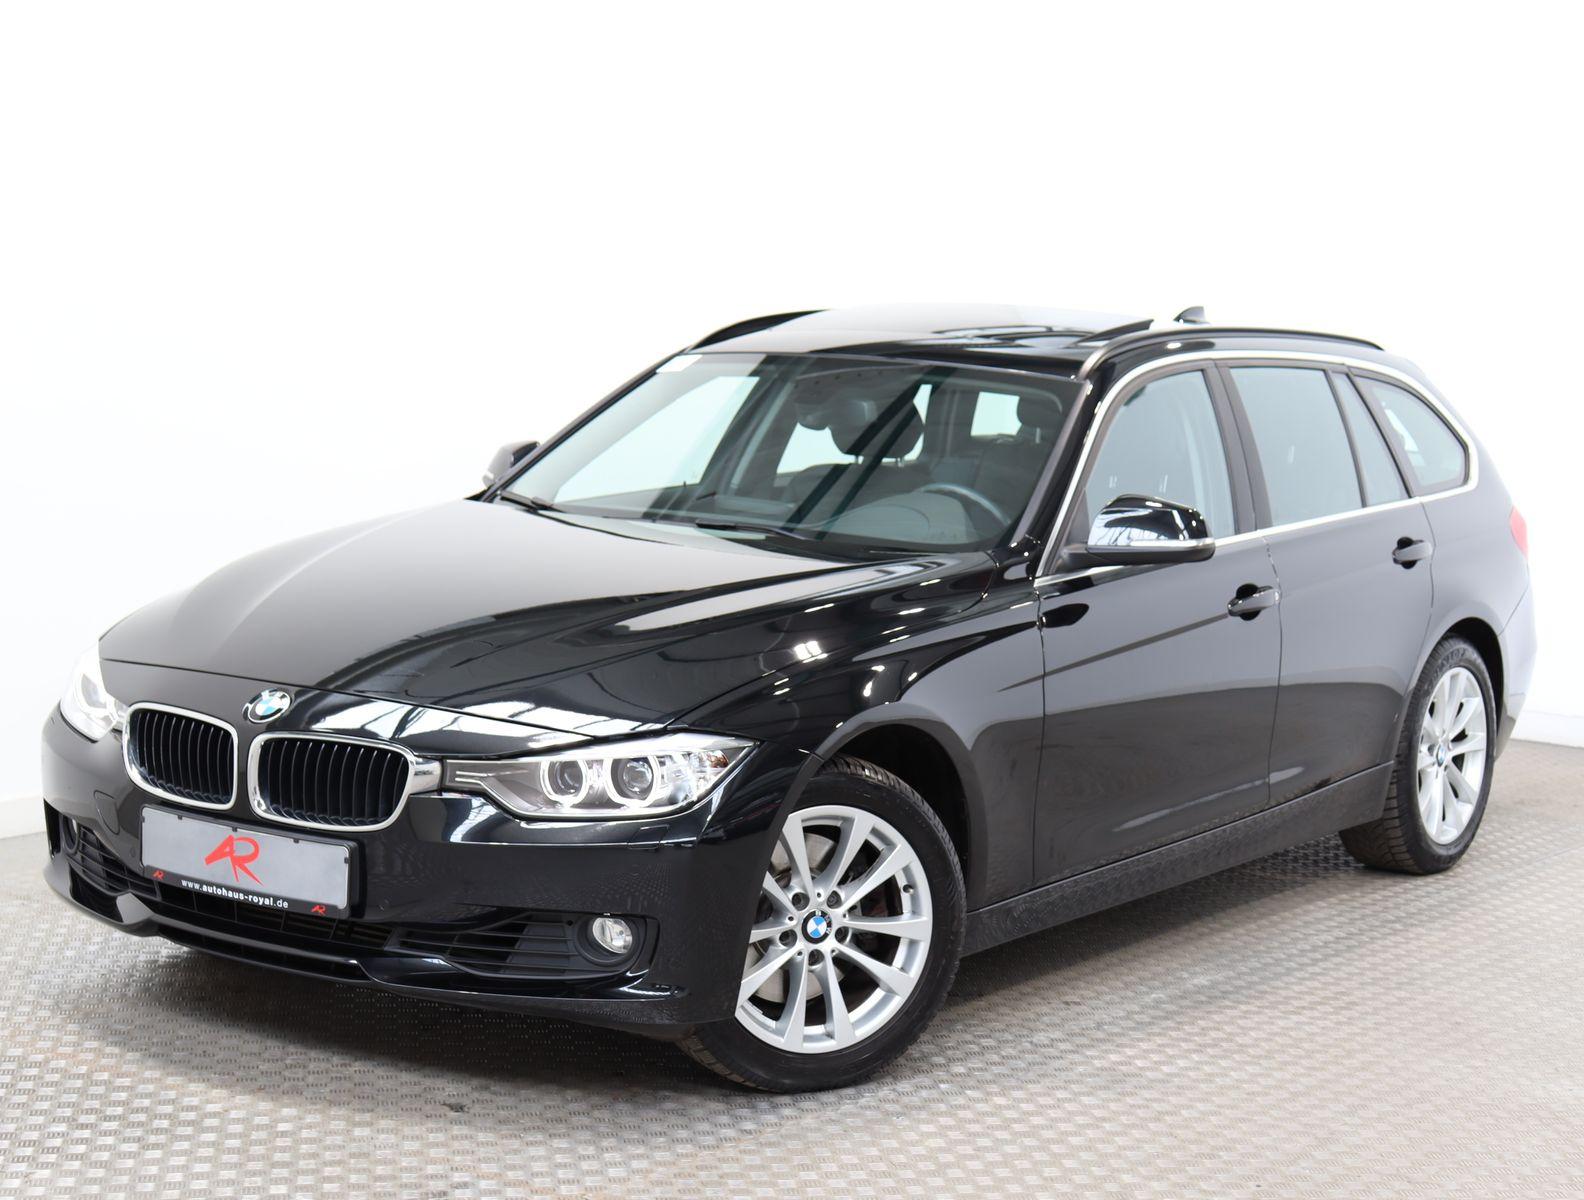 BMW 328 i xDrive T NAVIPROF,PANO,MEMORY,SPORTSITZE, Jahr 2013, Benzin